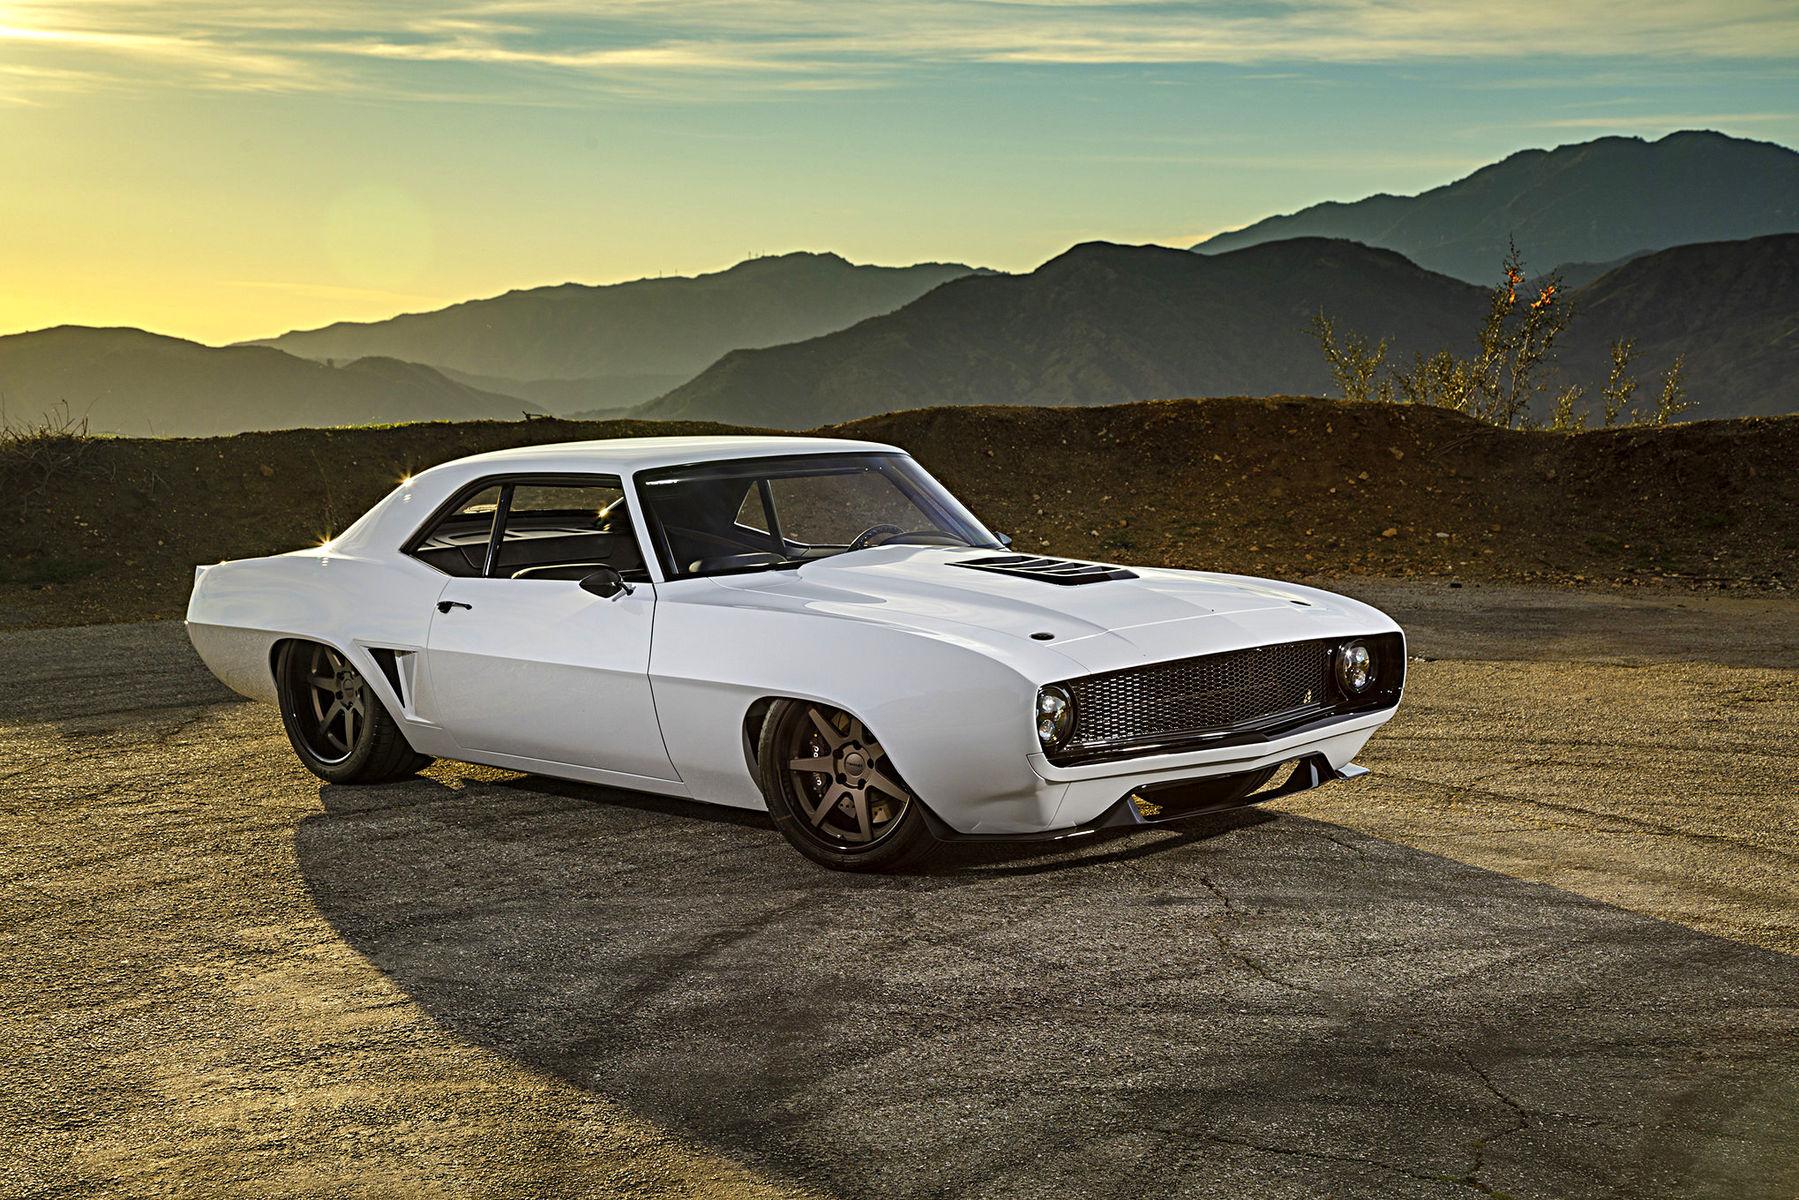 1969 Chevrolet Camaro | Josh Hodges' Born Vintage-Built Widebody '69 Camaro on Forgeline CV3C Wheels